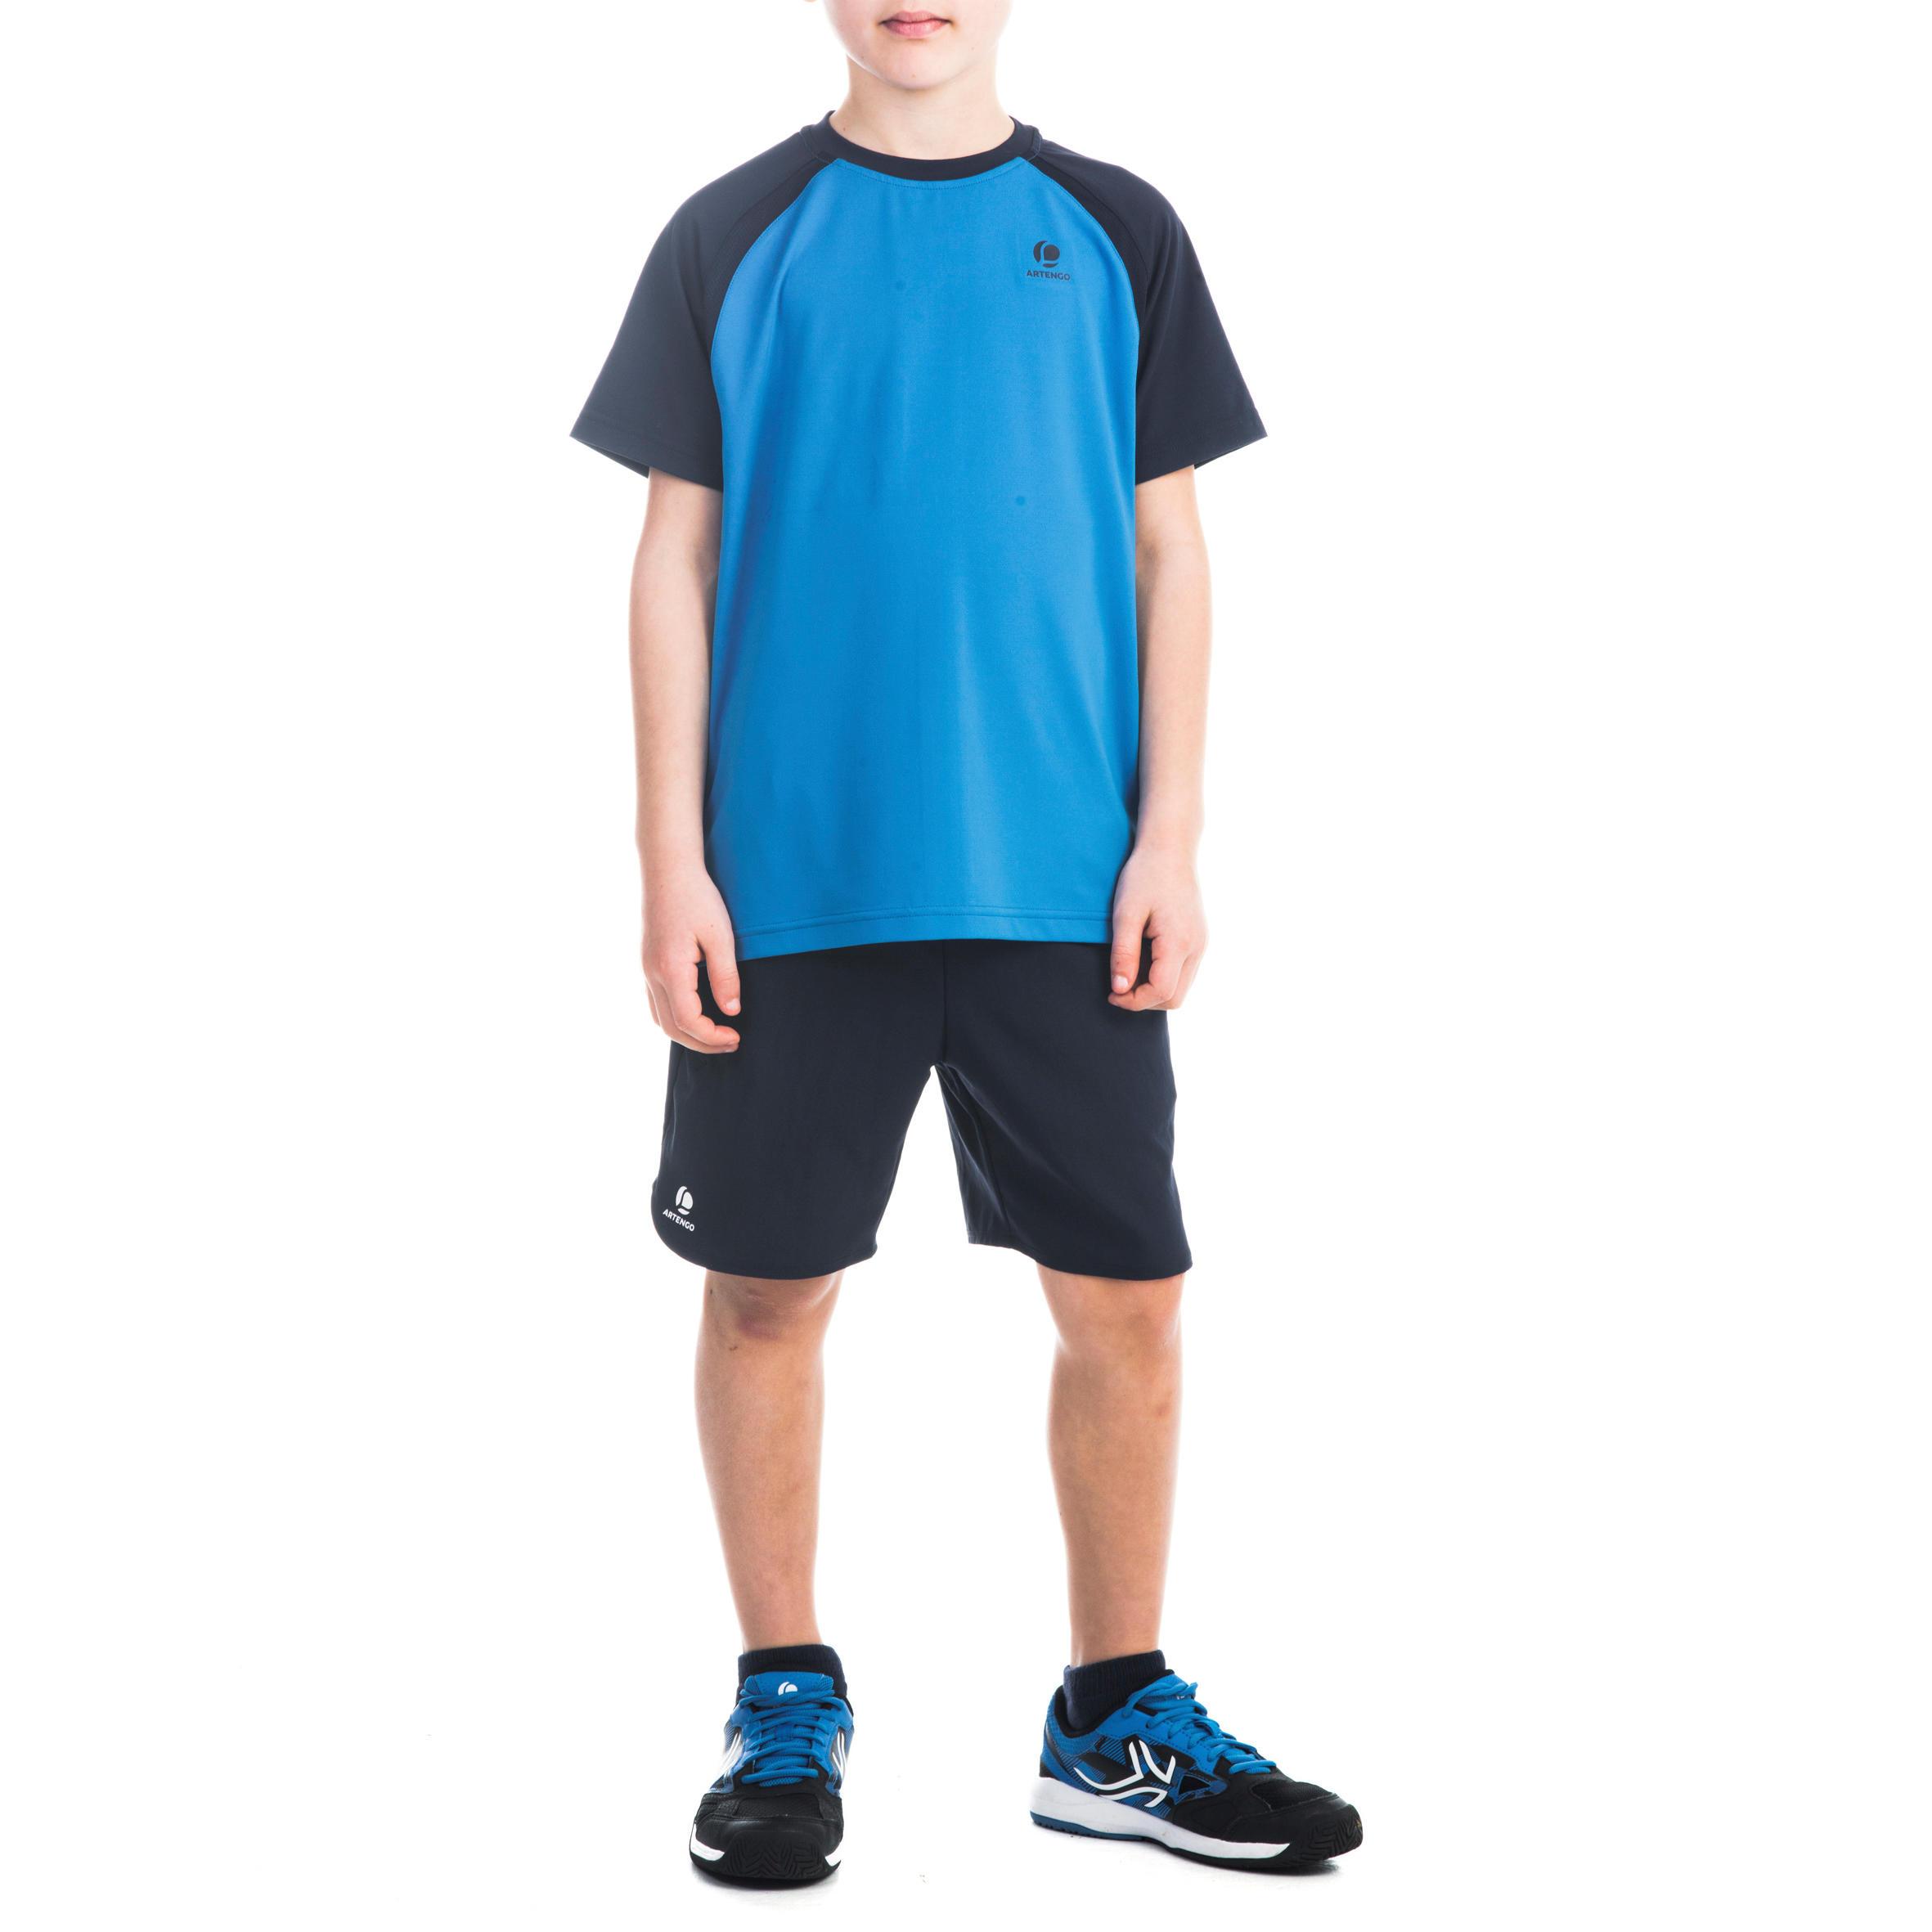 Shorts 500 Boys- Navy Blue